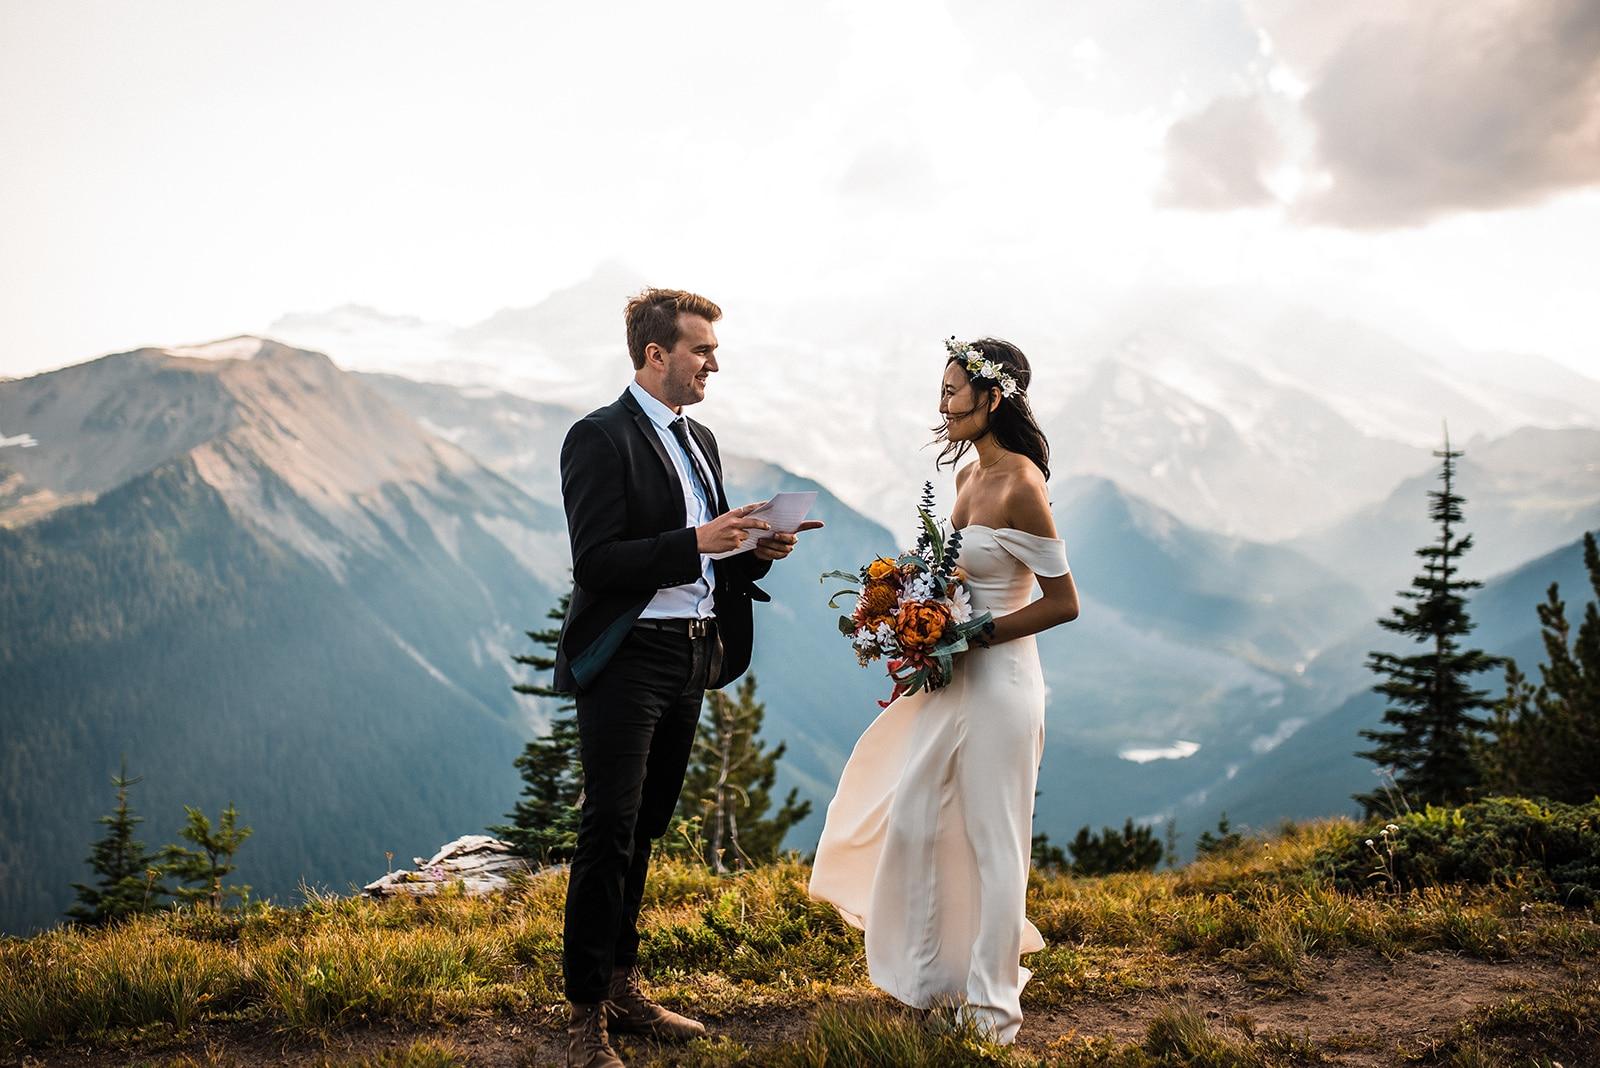 eloping in america